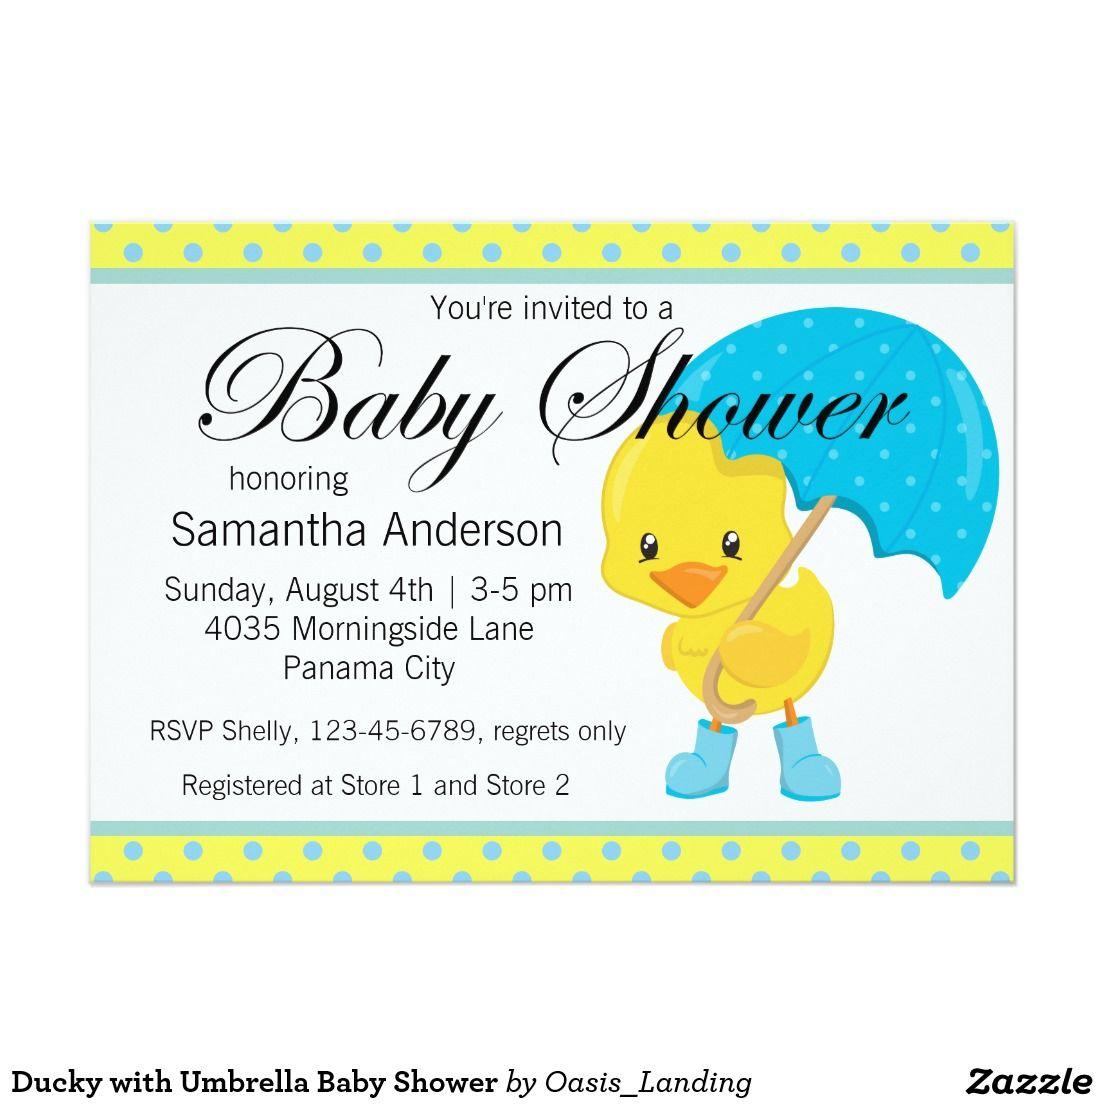 Ducky with Umbrella Baby Shower Card   Umbrella baby shower